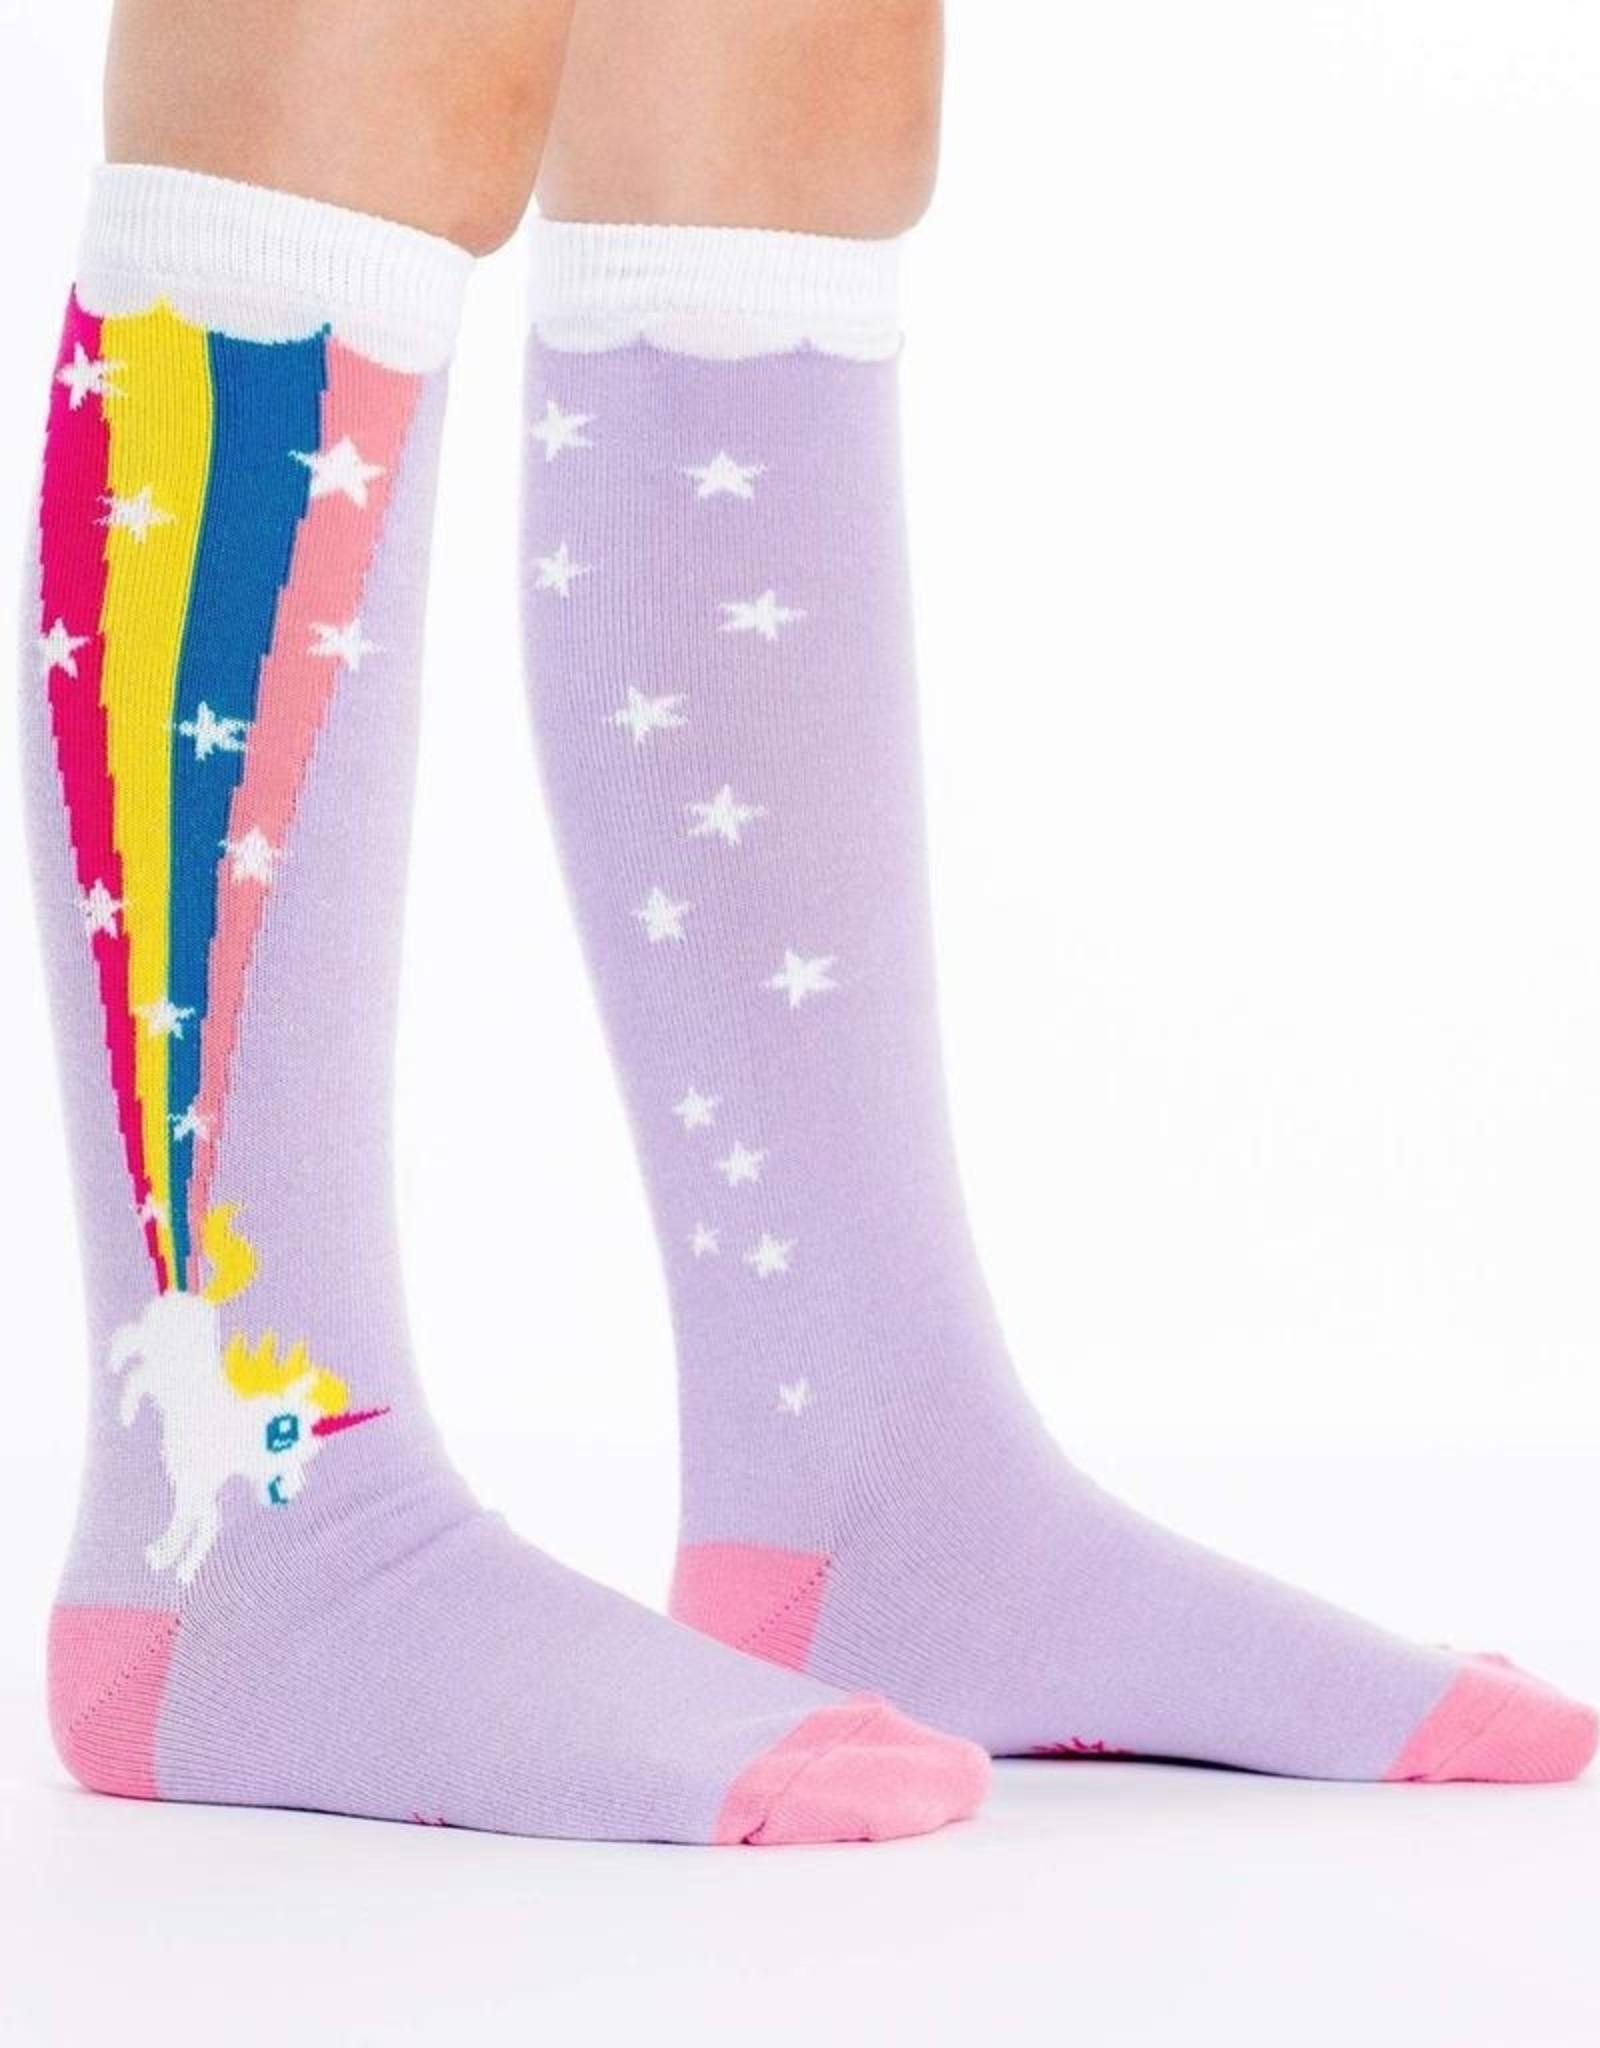 Sock It To Me Junior Knee High Socks